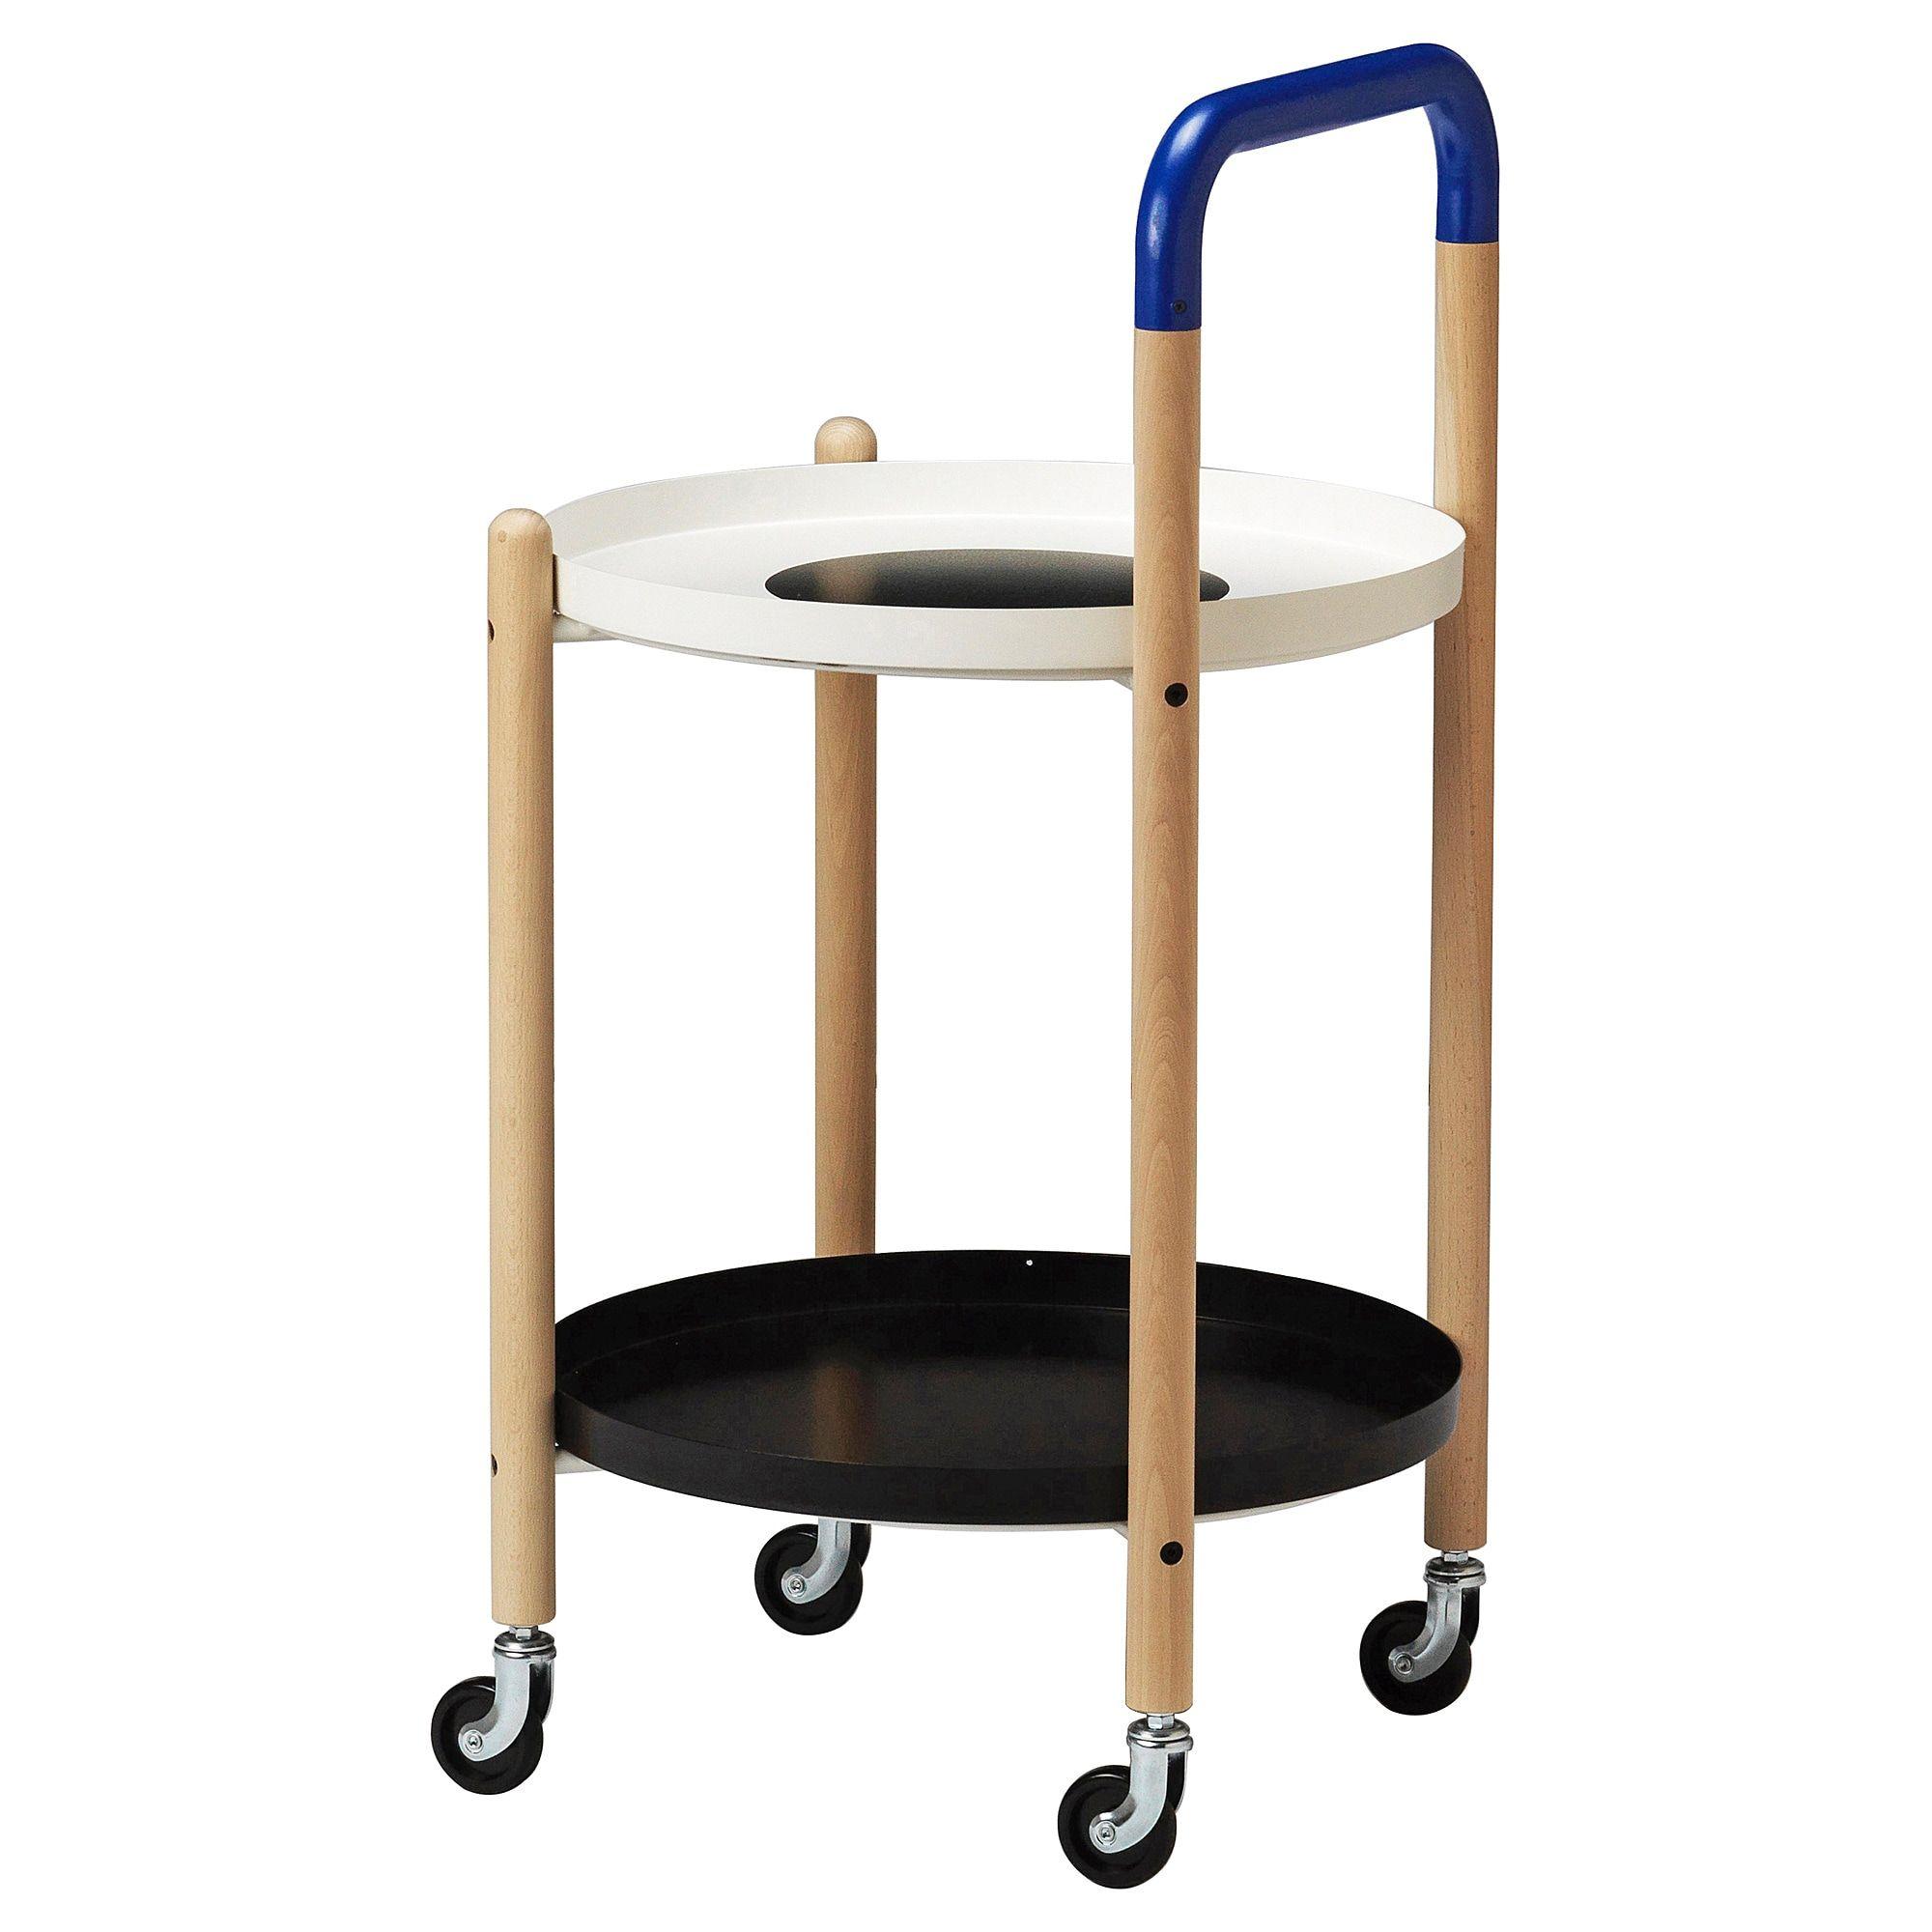 Us Furniture And Home Furnishings Beistelltisch Rollen Beistelltisch Ikea